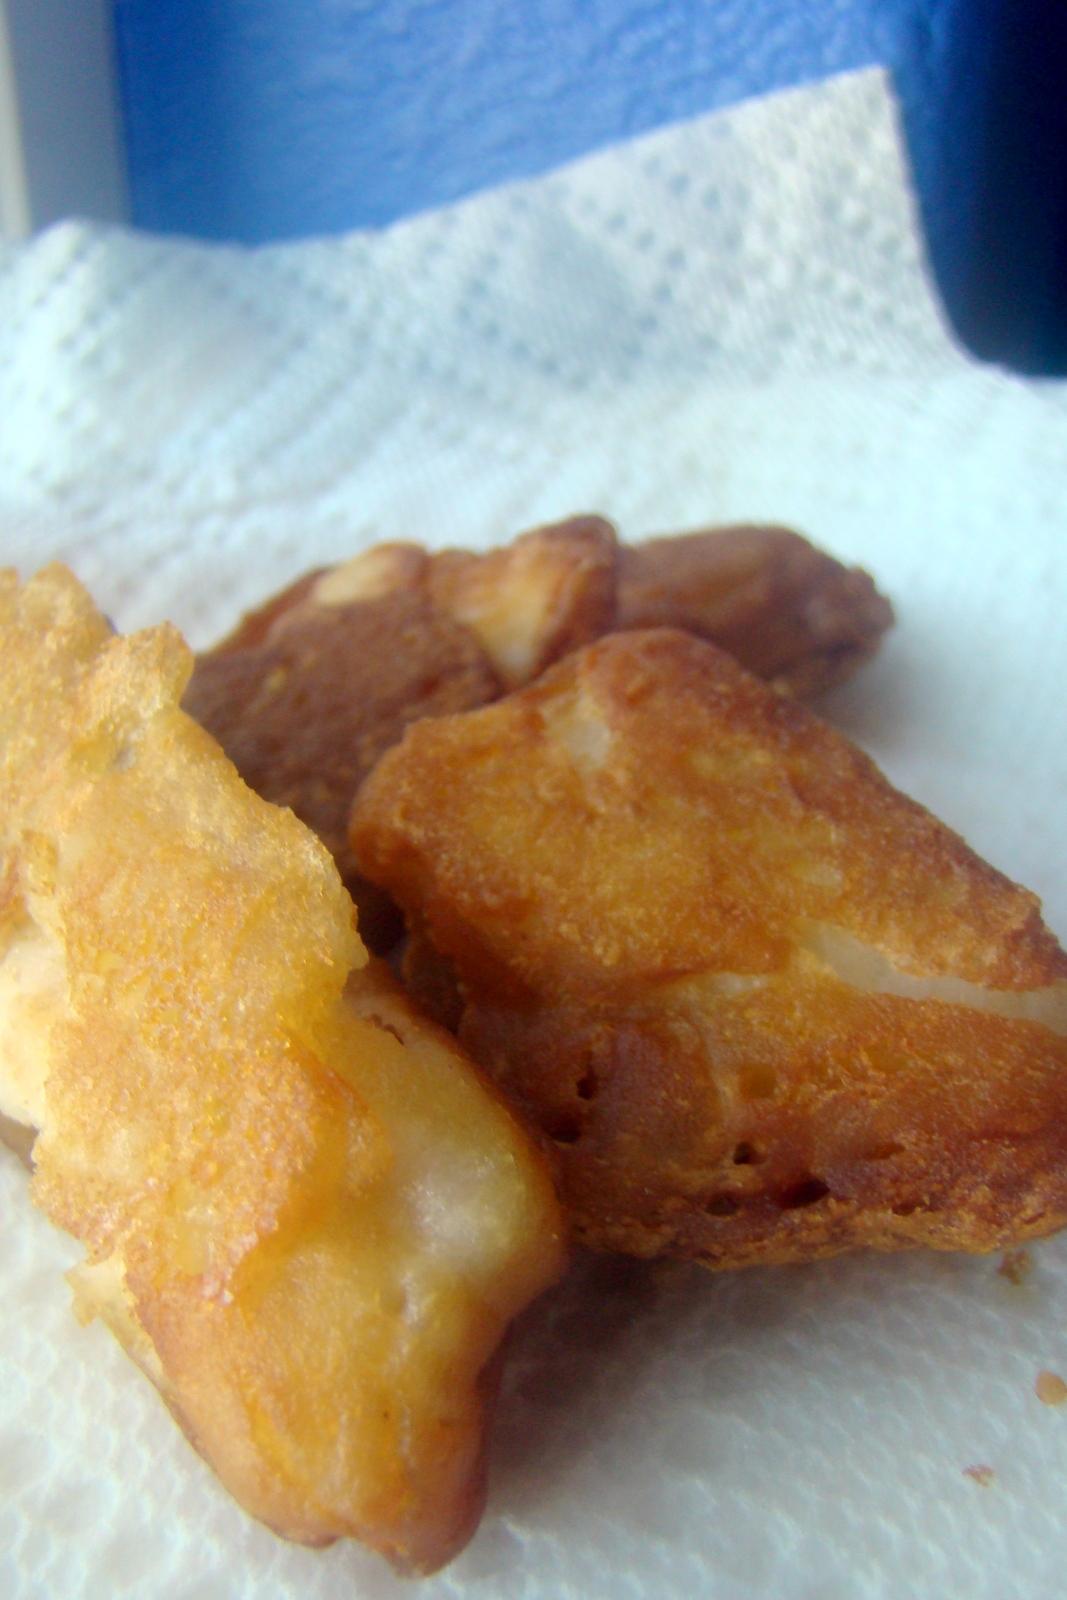 Nourished and nurtured crispy kombucha battered fish with for Fish sauce gluten free